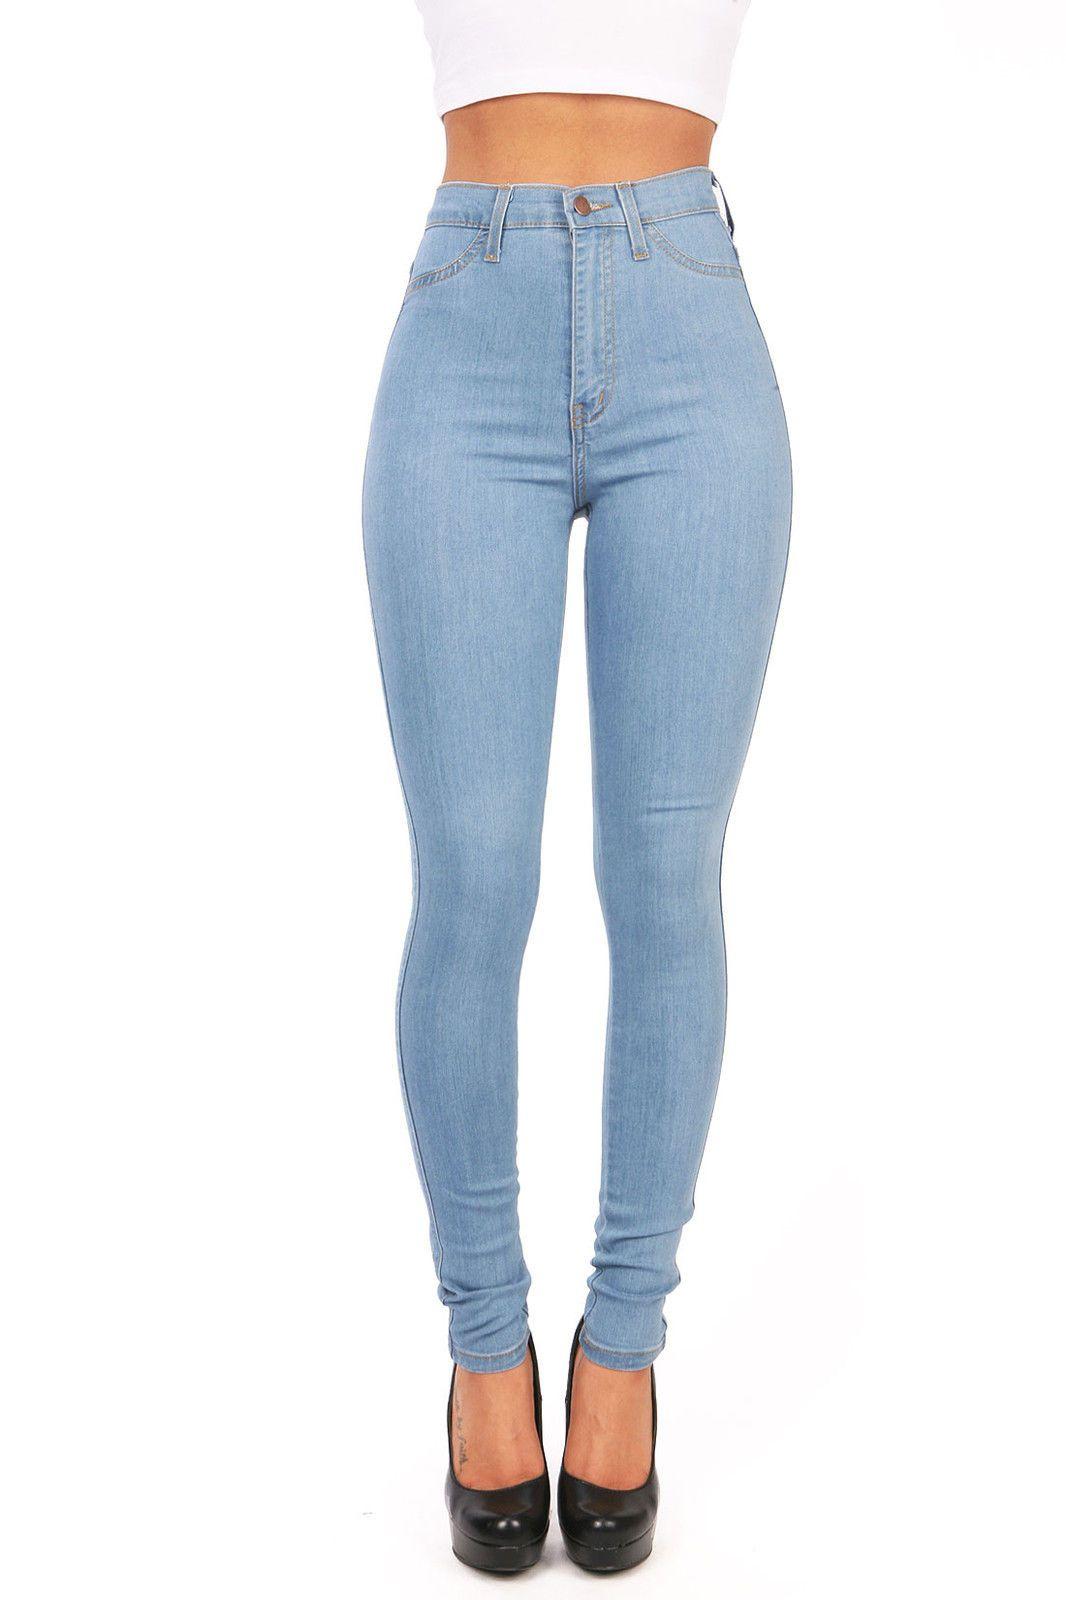 Vibrant Denim High Waist Womens Skinny Jeans High Waisted Skinnys Long Pants  Usa aef741d254cf6